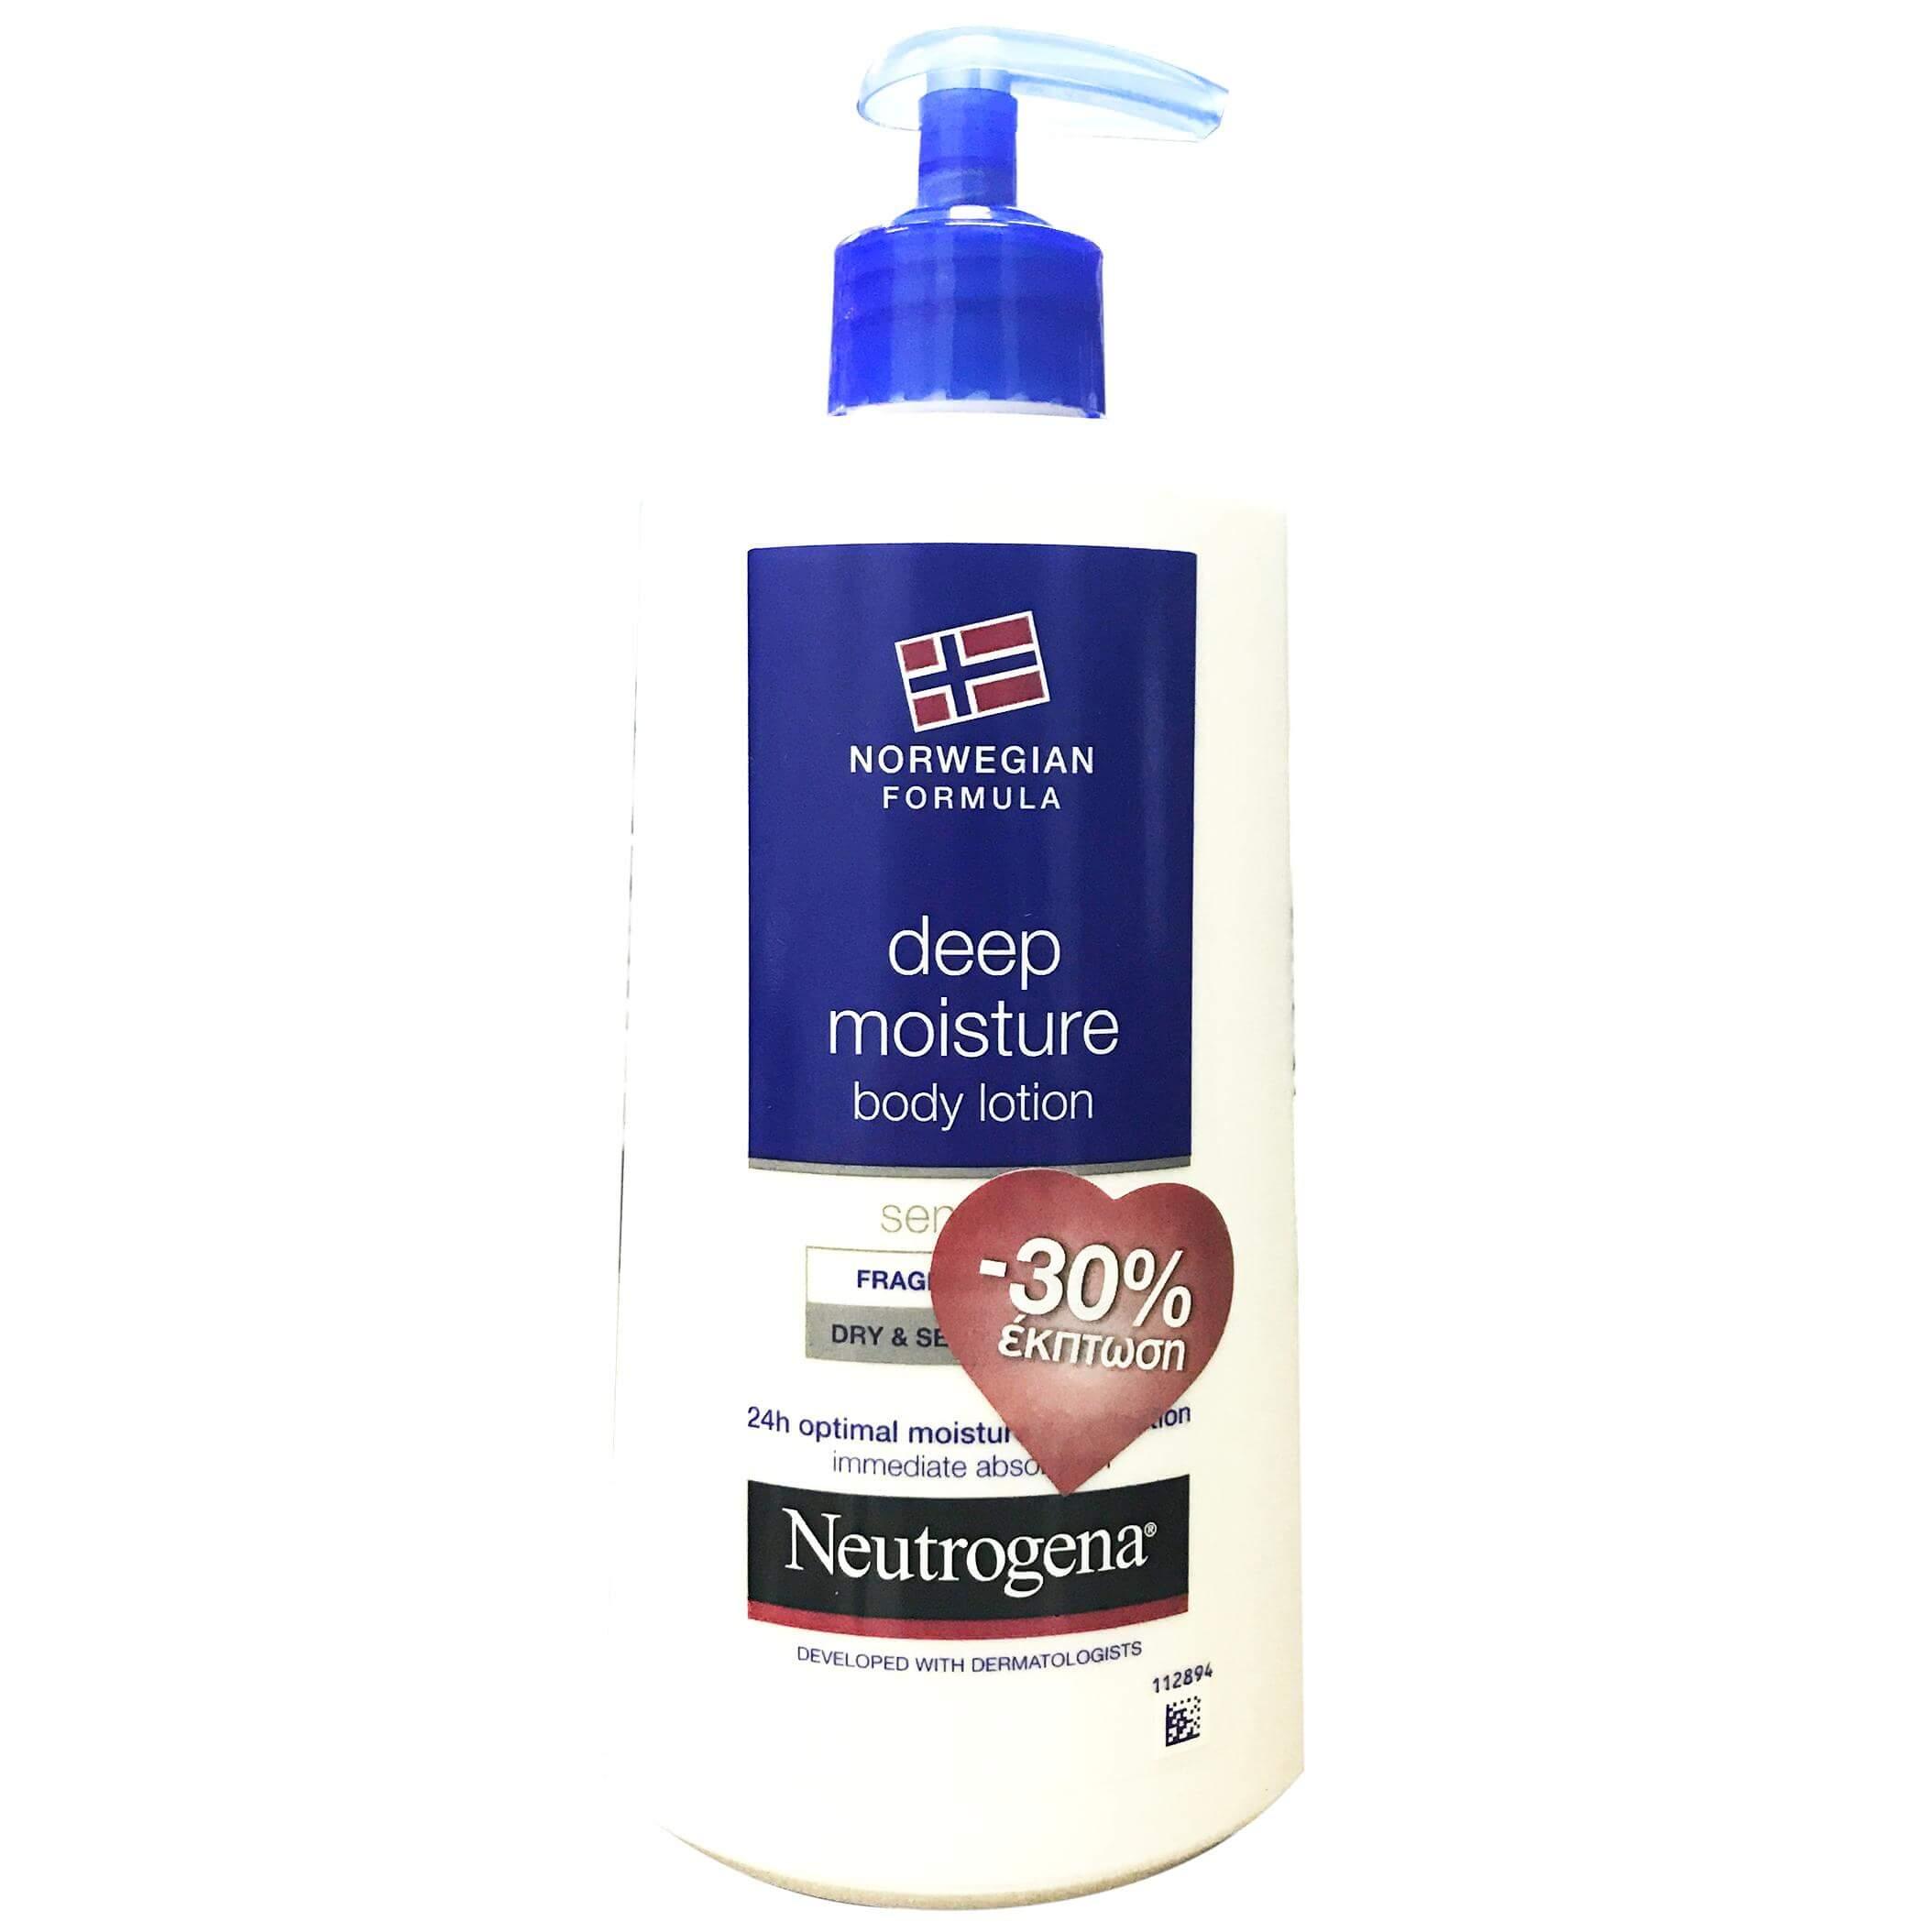 Neutrogena Deep Moisture Body Lotion ΕνυδατικόΓαλάκτωμα Σώματοςγια Ξηρή & Ευαίσθητη Επιδερμίδα Χωρίς Άρωμα 400mlPromo -30%